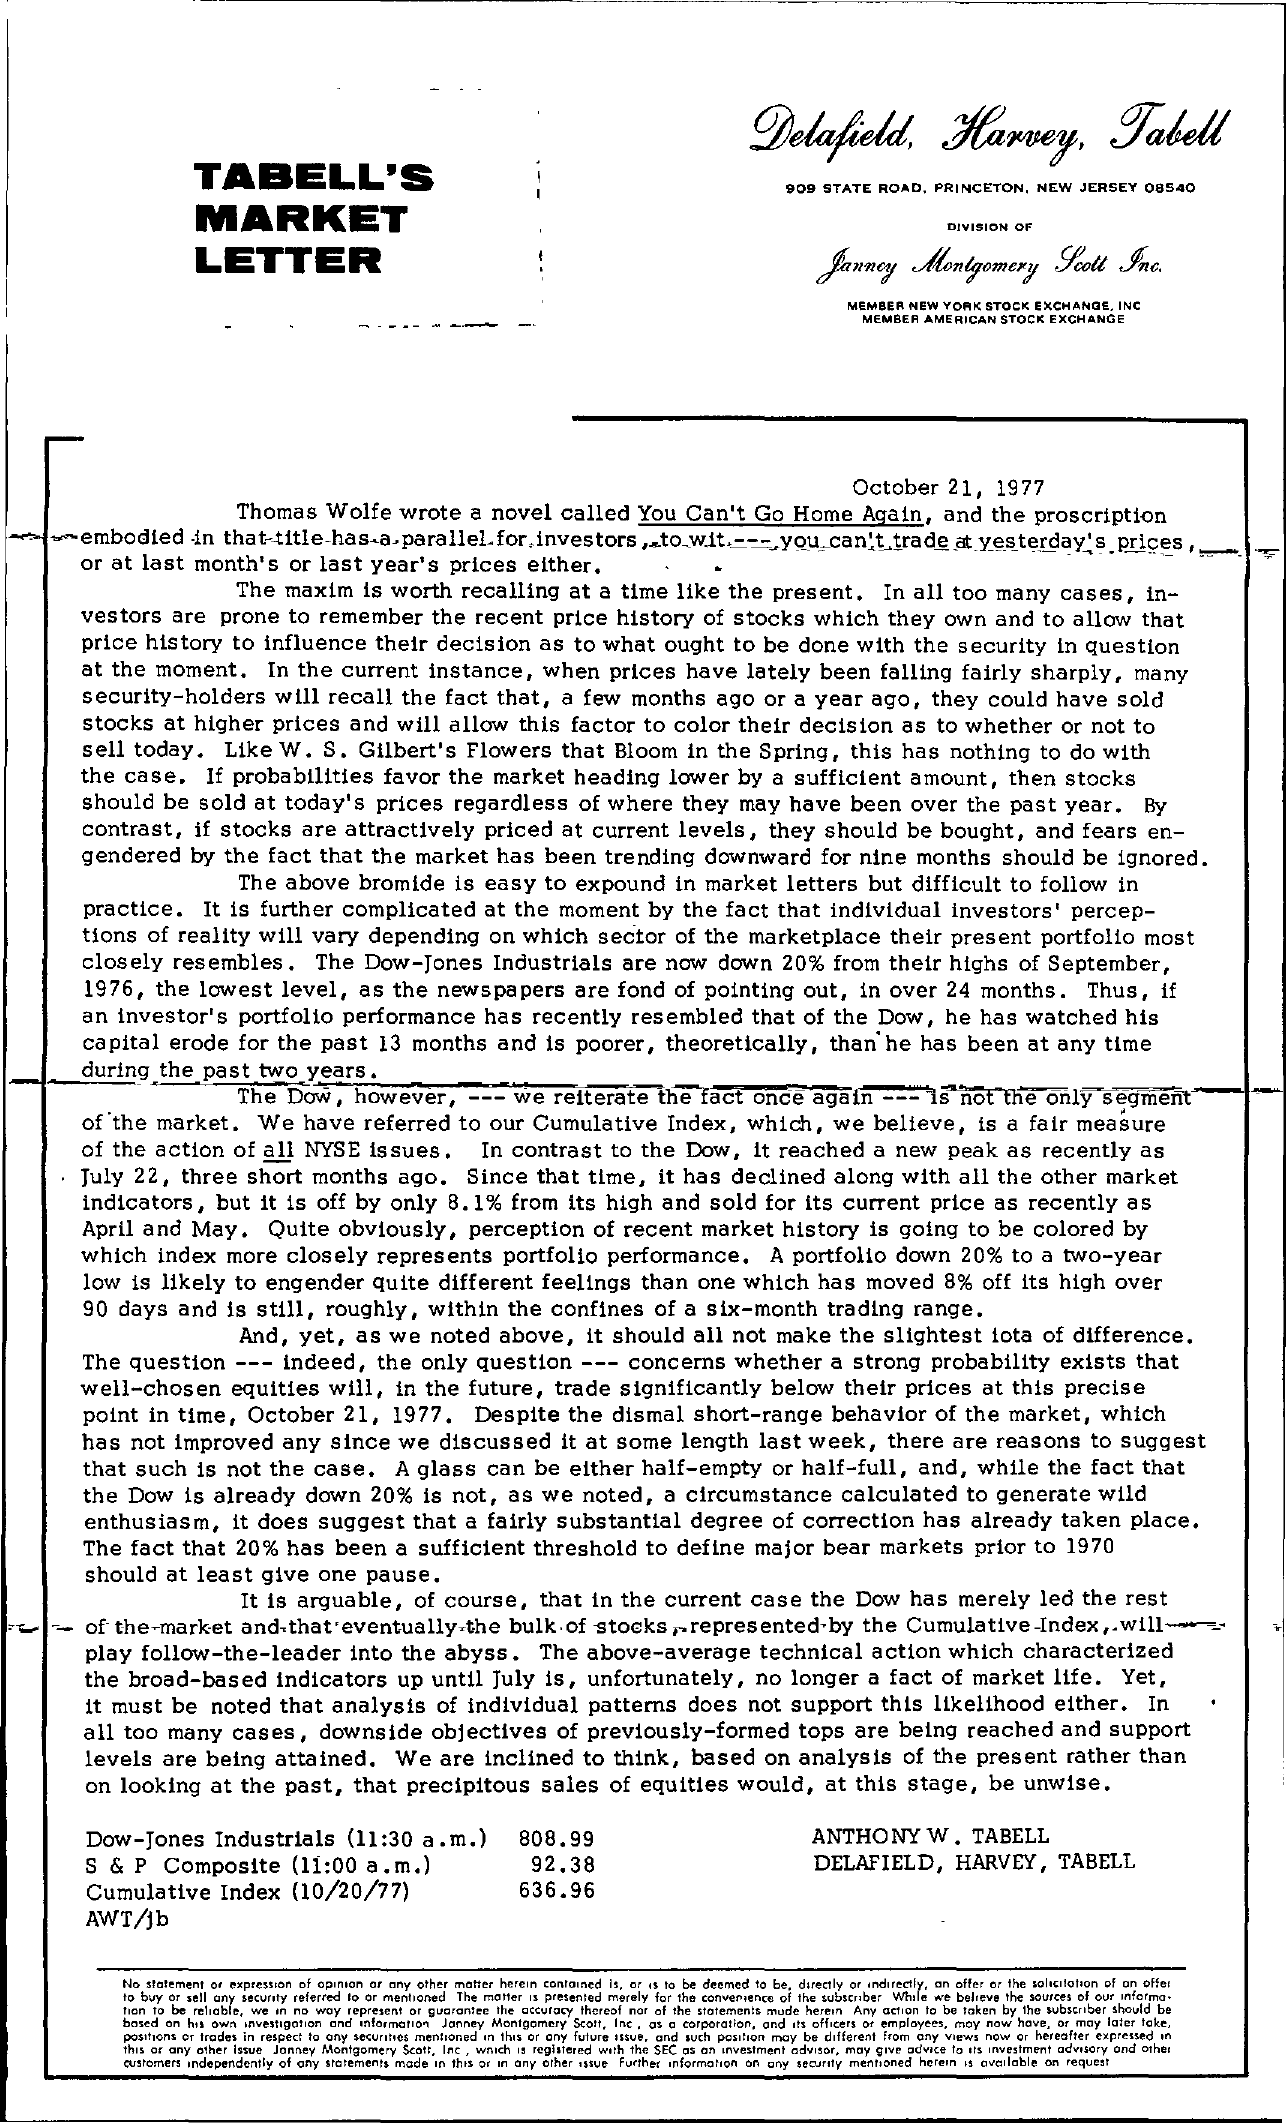 Tabell's Market Letter - October 21, 1977